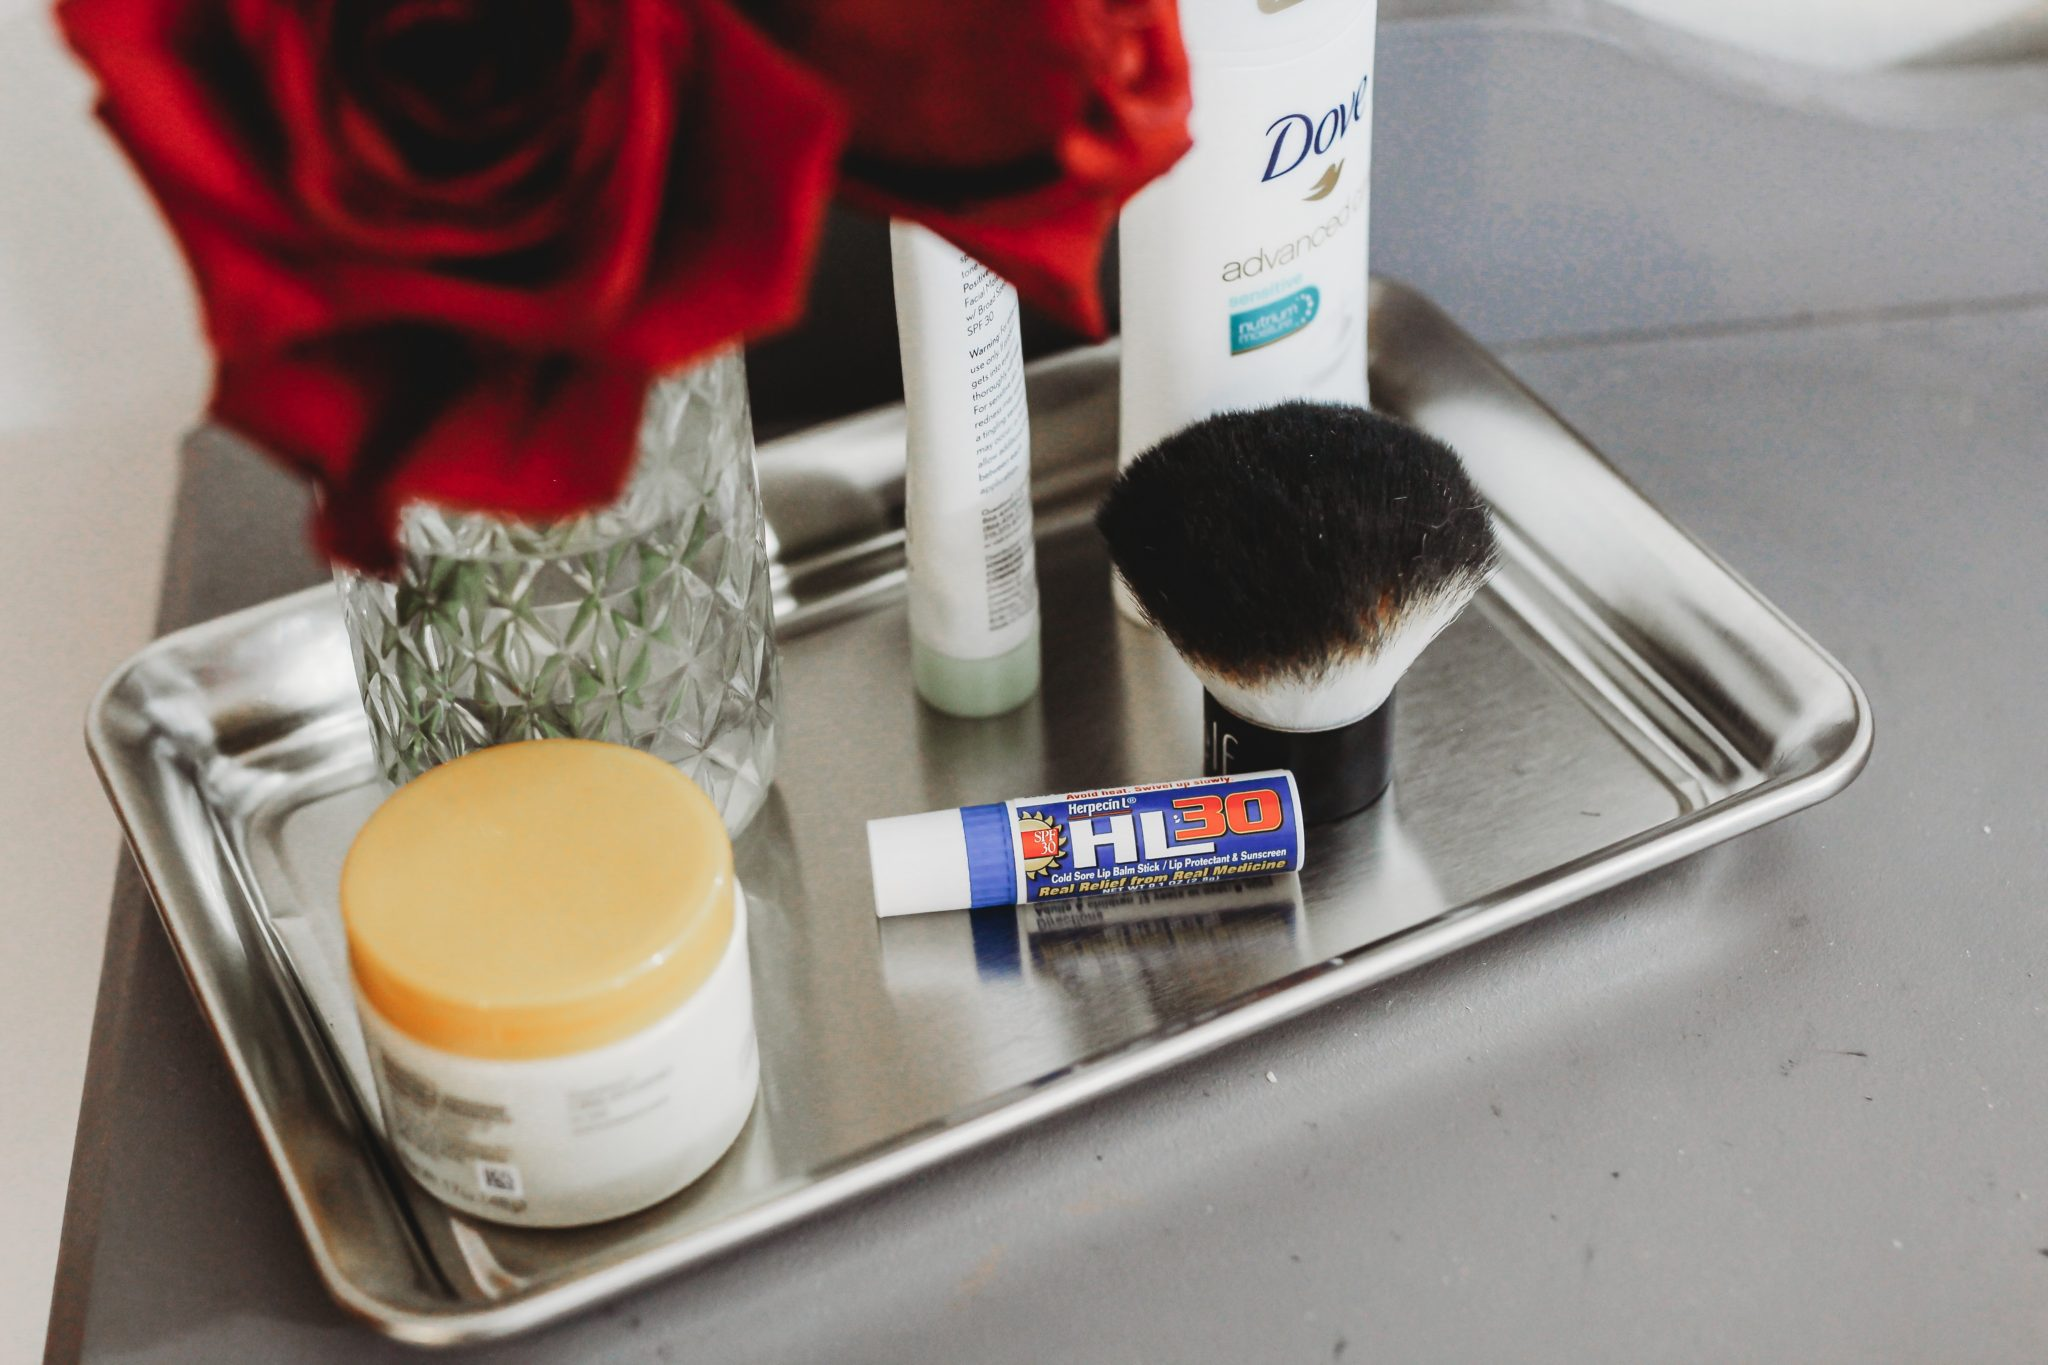 3 Surprising Winter Beauty Swaps, Winter Skincare Products, Winter Beauty Products, Cold Weather skincare routine